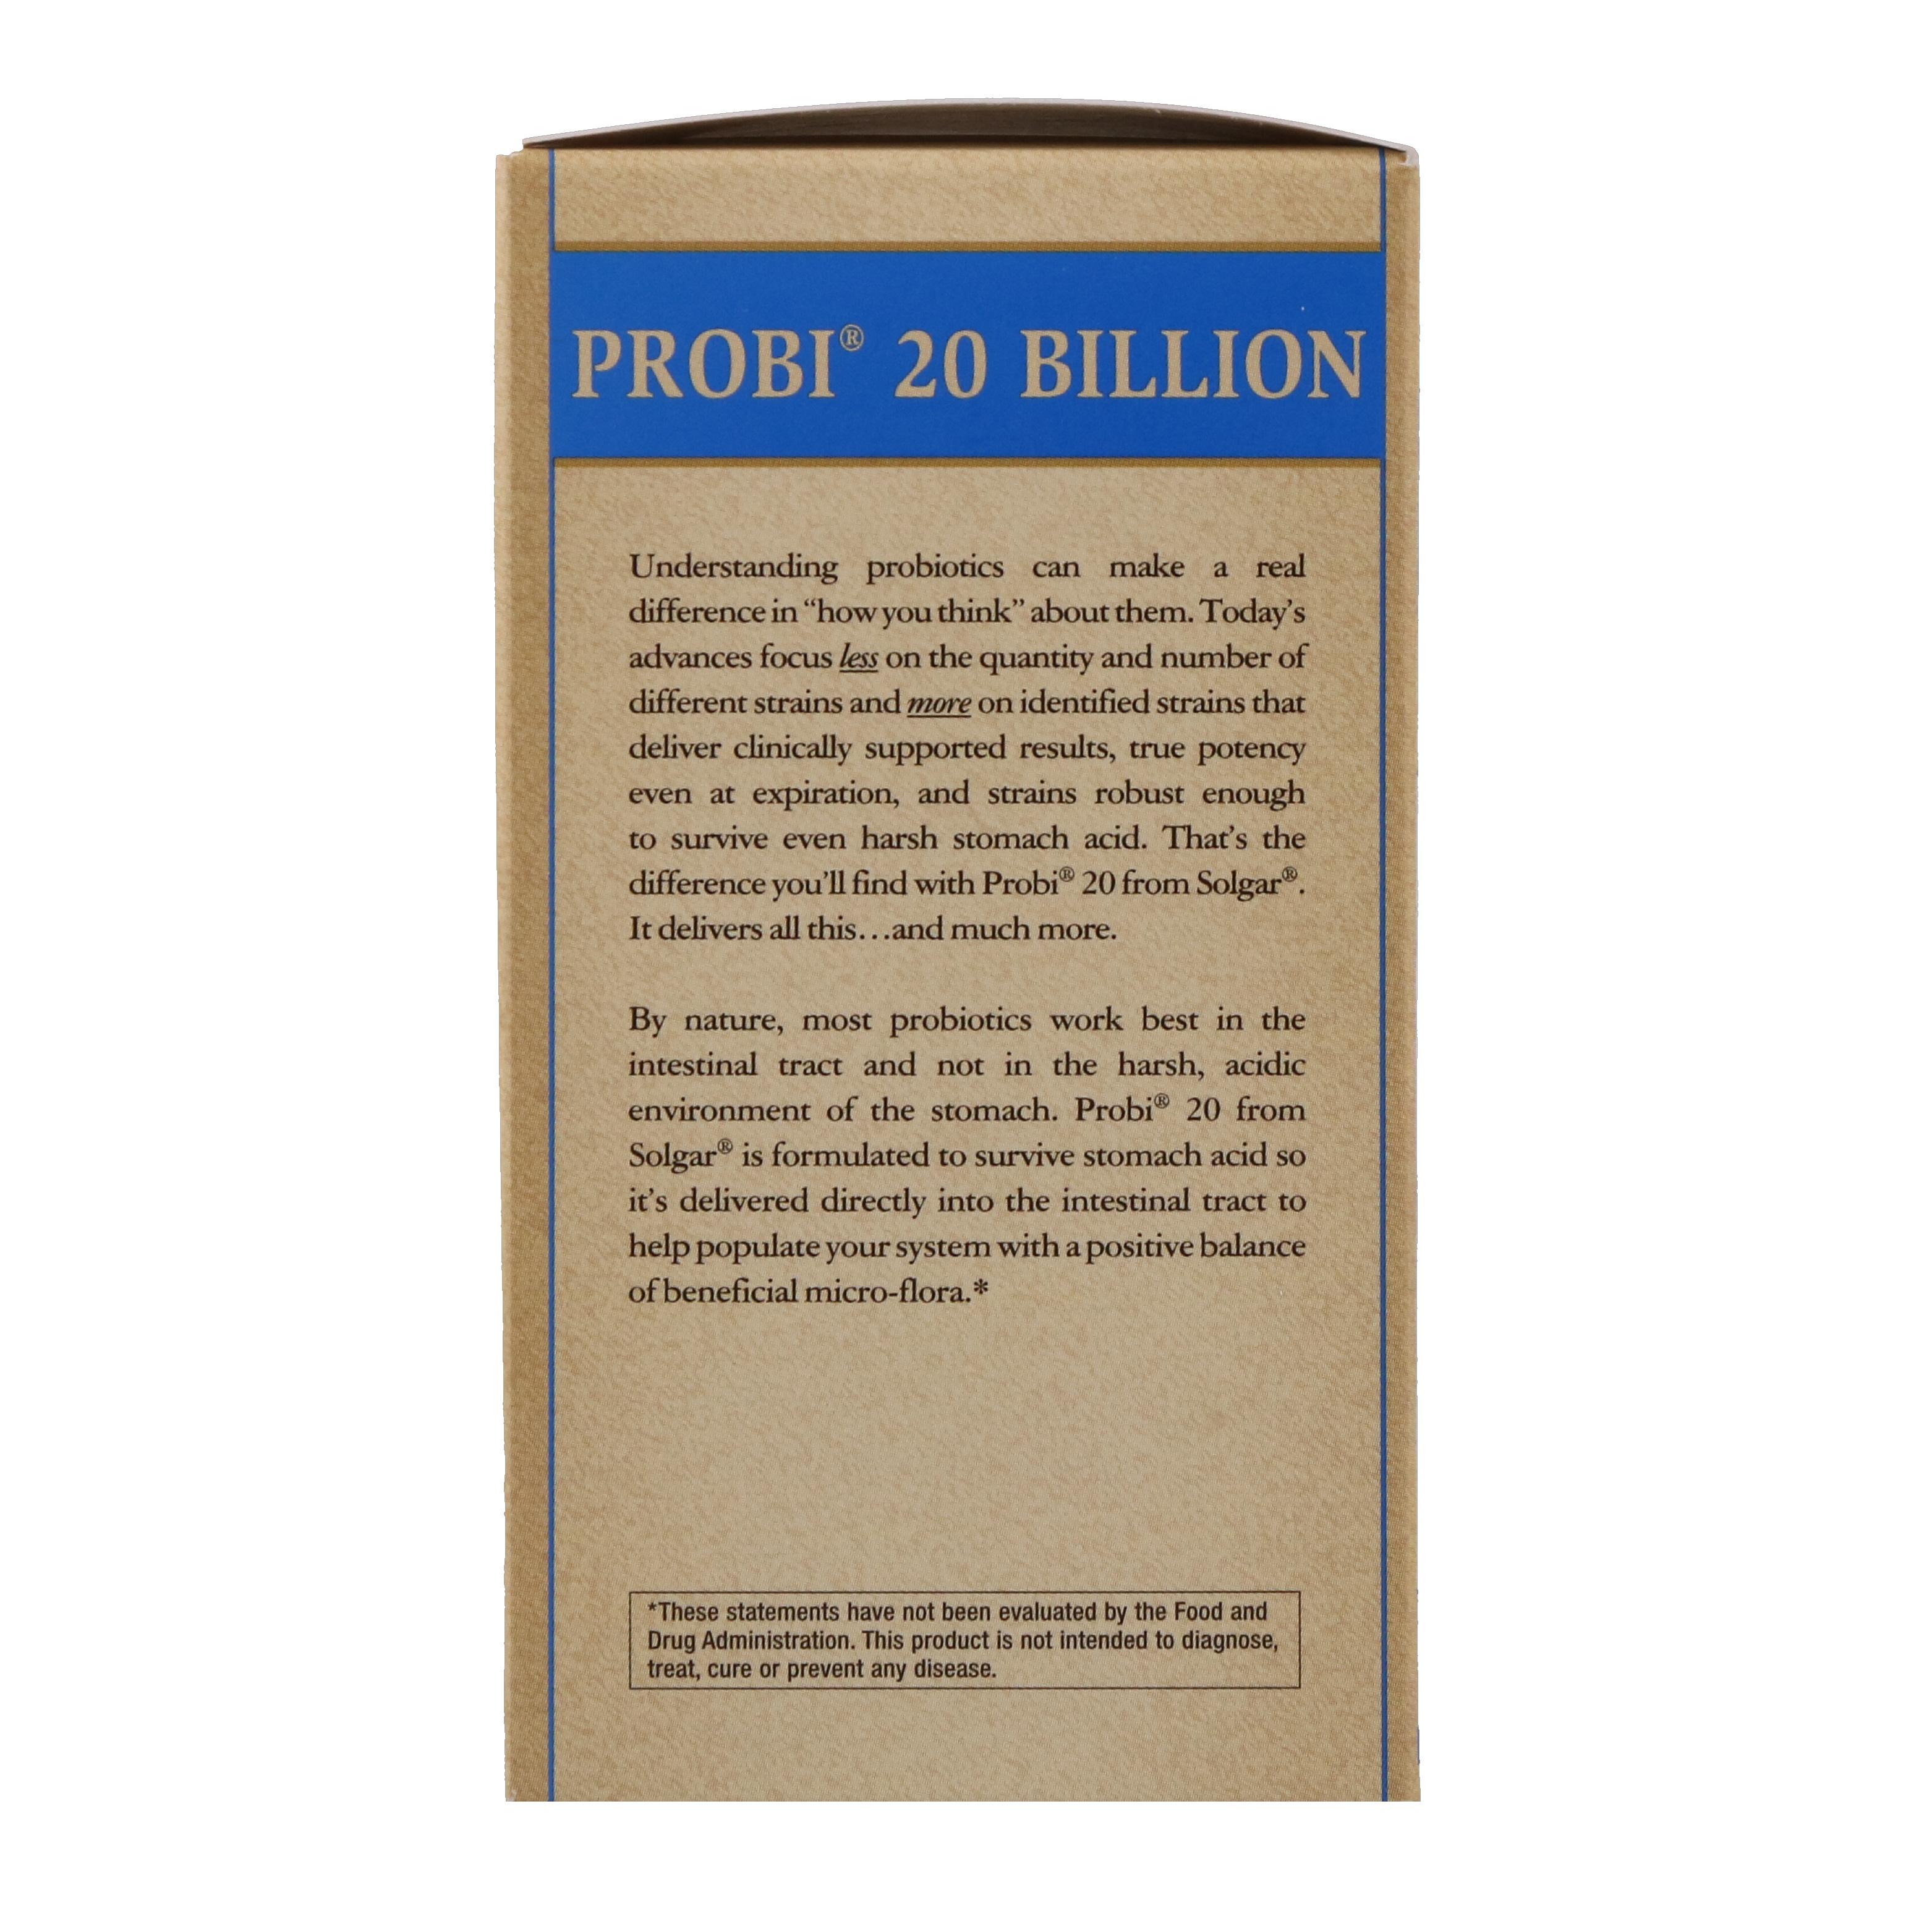 Solgar, Probi 20 Billion, 30 Vegetable Capsules - iHerb.com